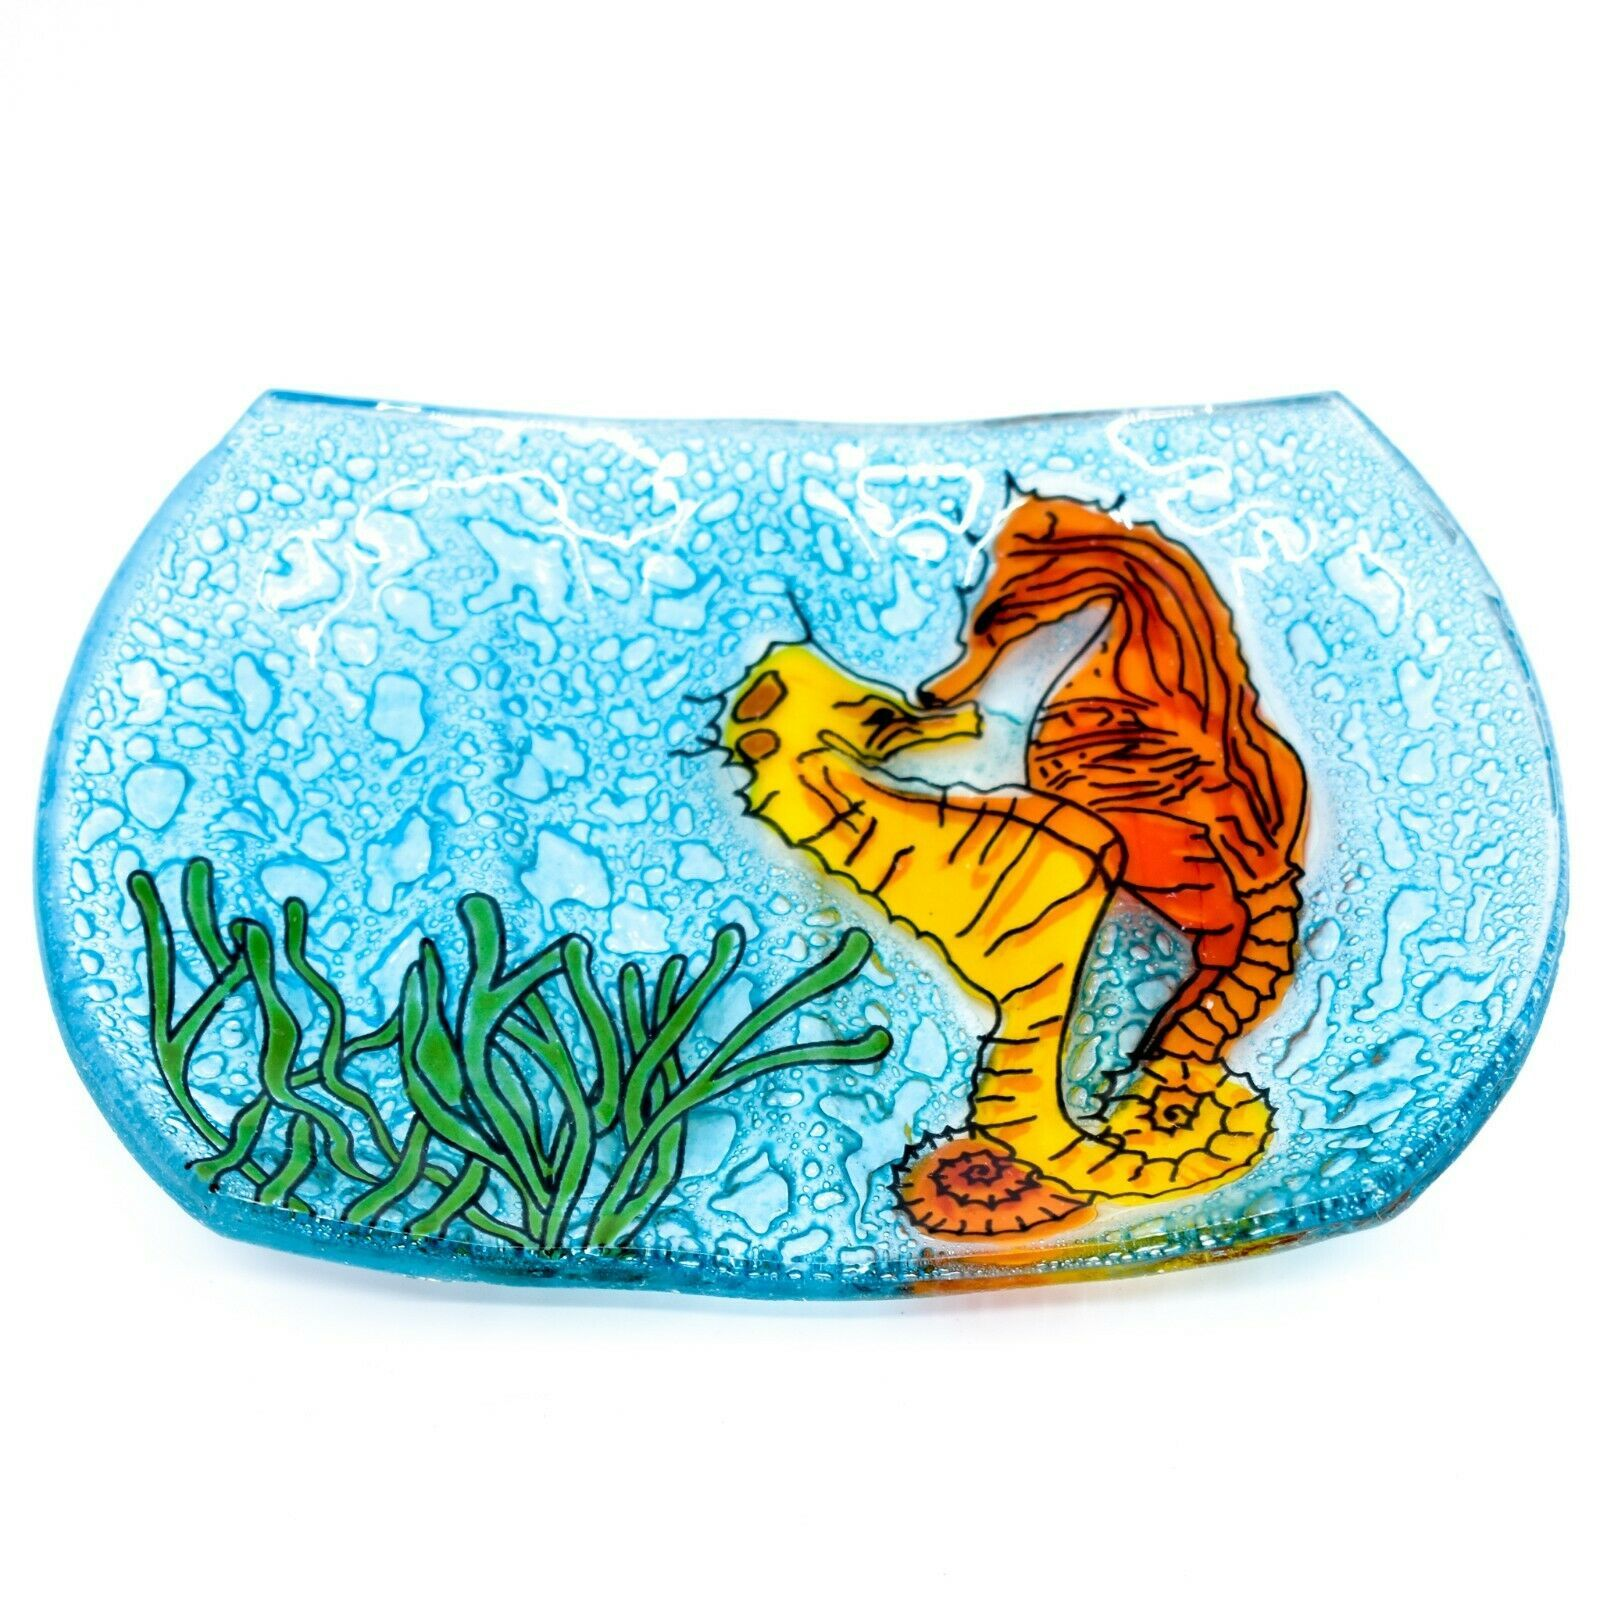 Fused Art Glass Seahorse Marine Ocean Design Soap Dish Handmade in Ecuador